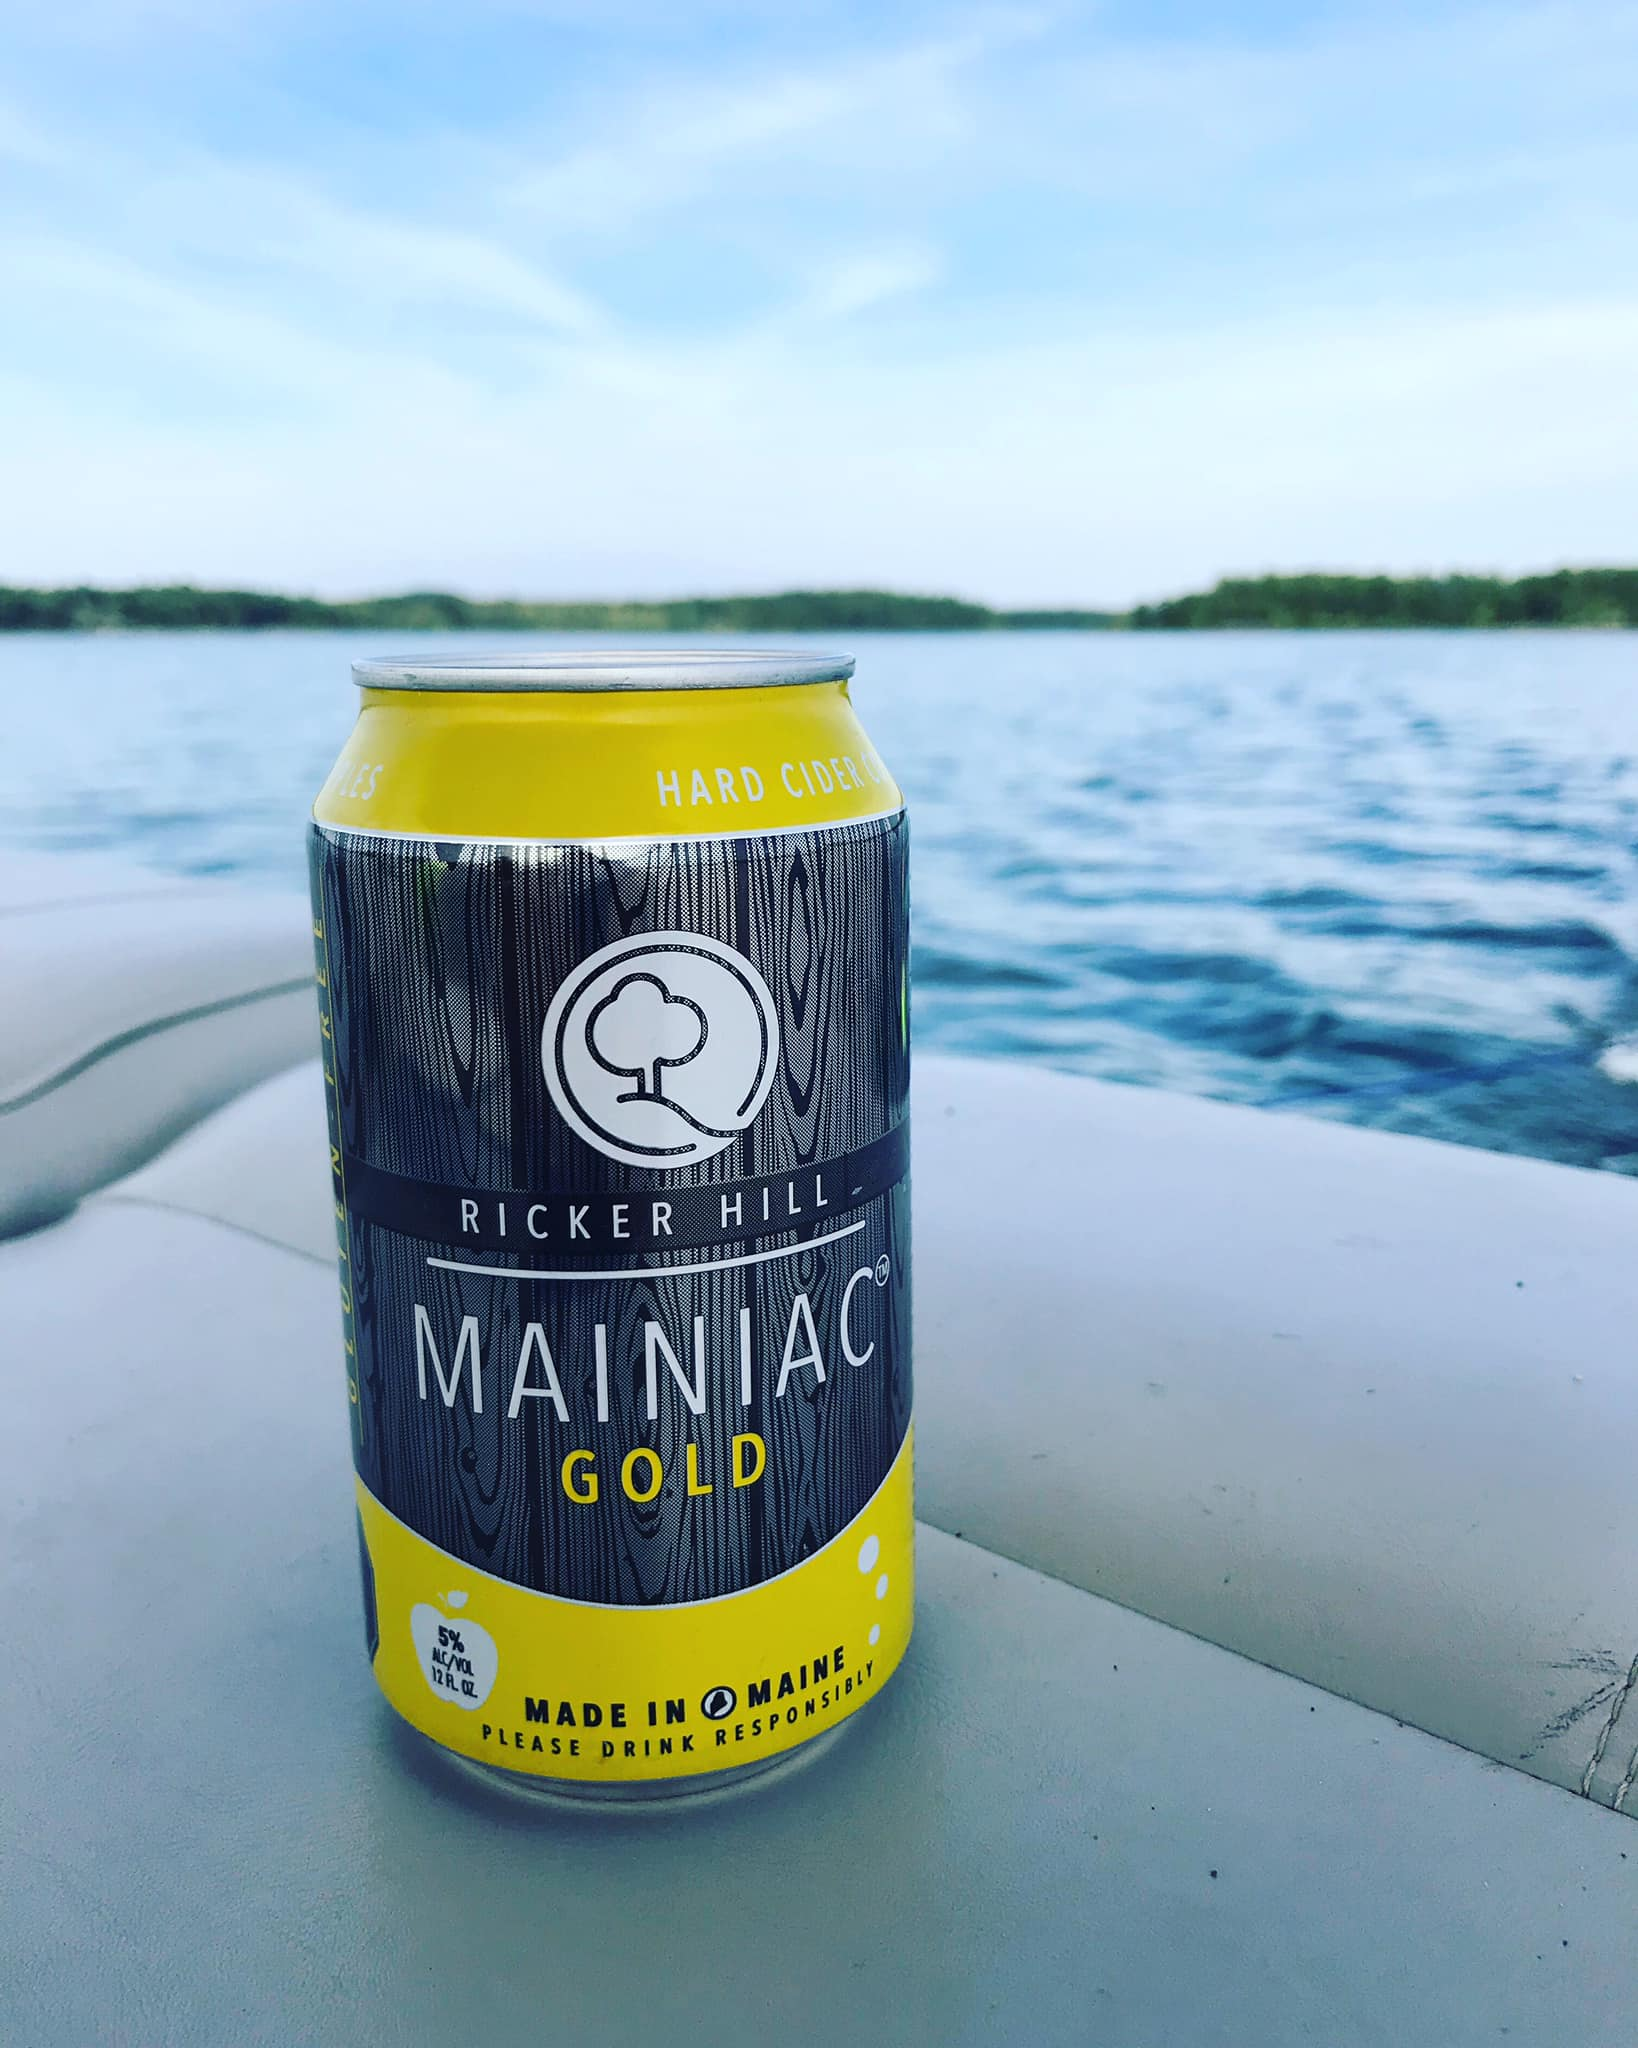 Ricker Hill Mainiac Gold Hard Cider